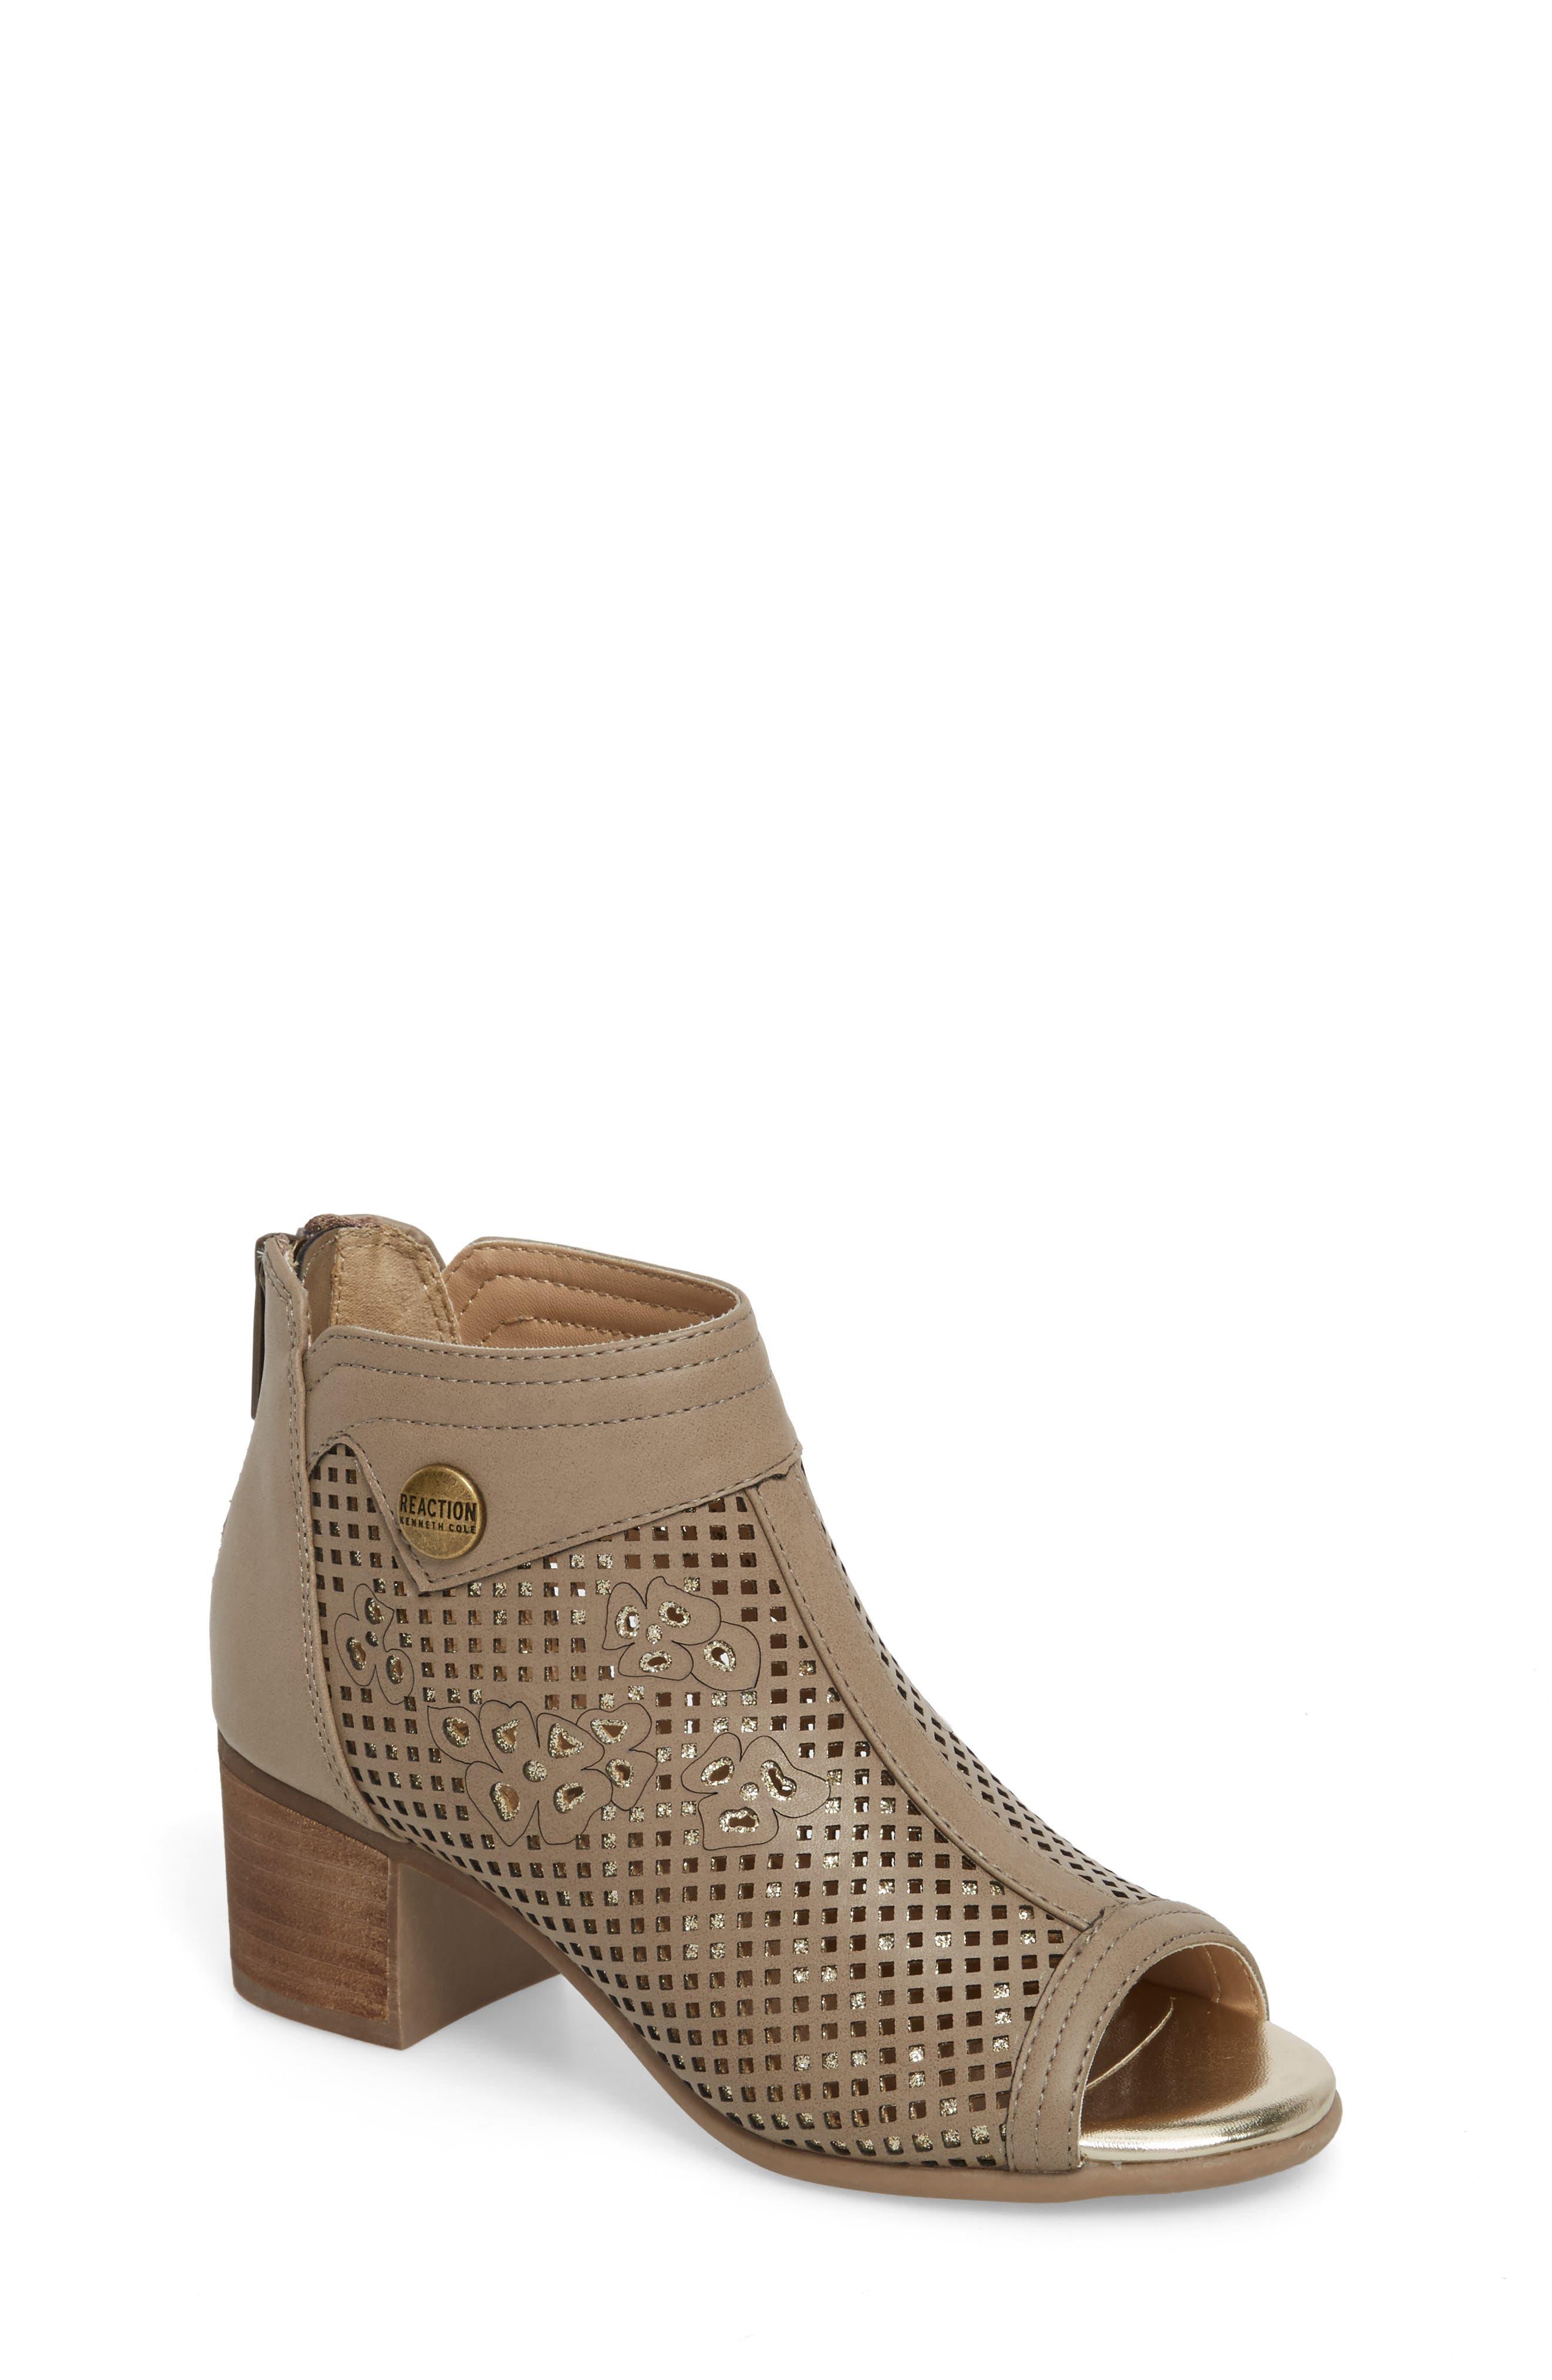 Level One Sandal,                         Main,                         color, Tan